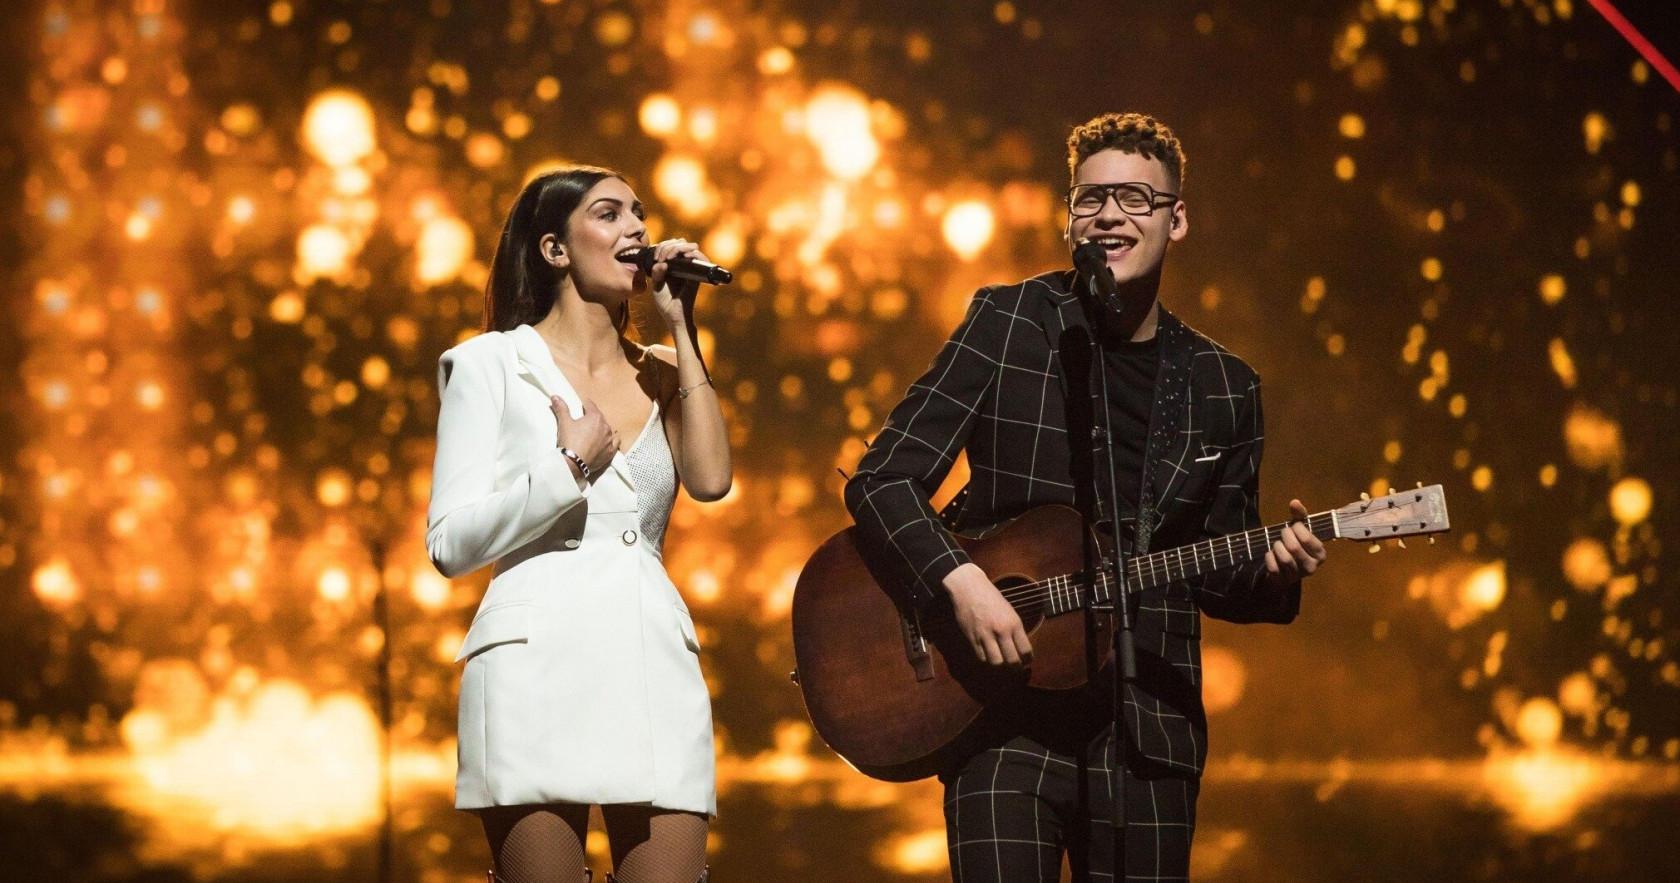 Denmark: DR confirms Eurovision 2021 participation and DMGP 2021 edition